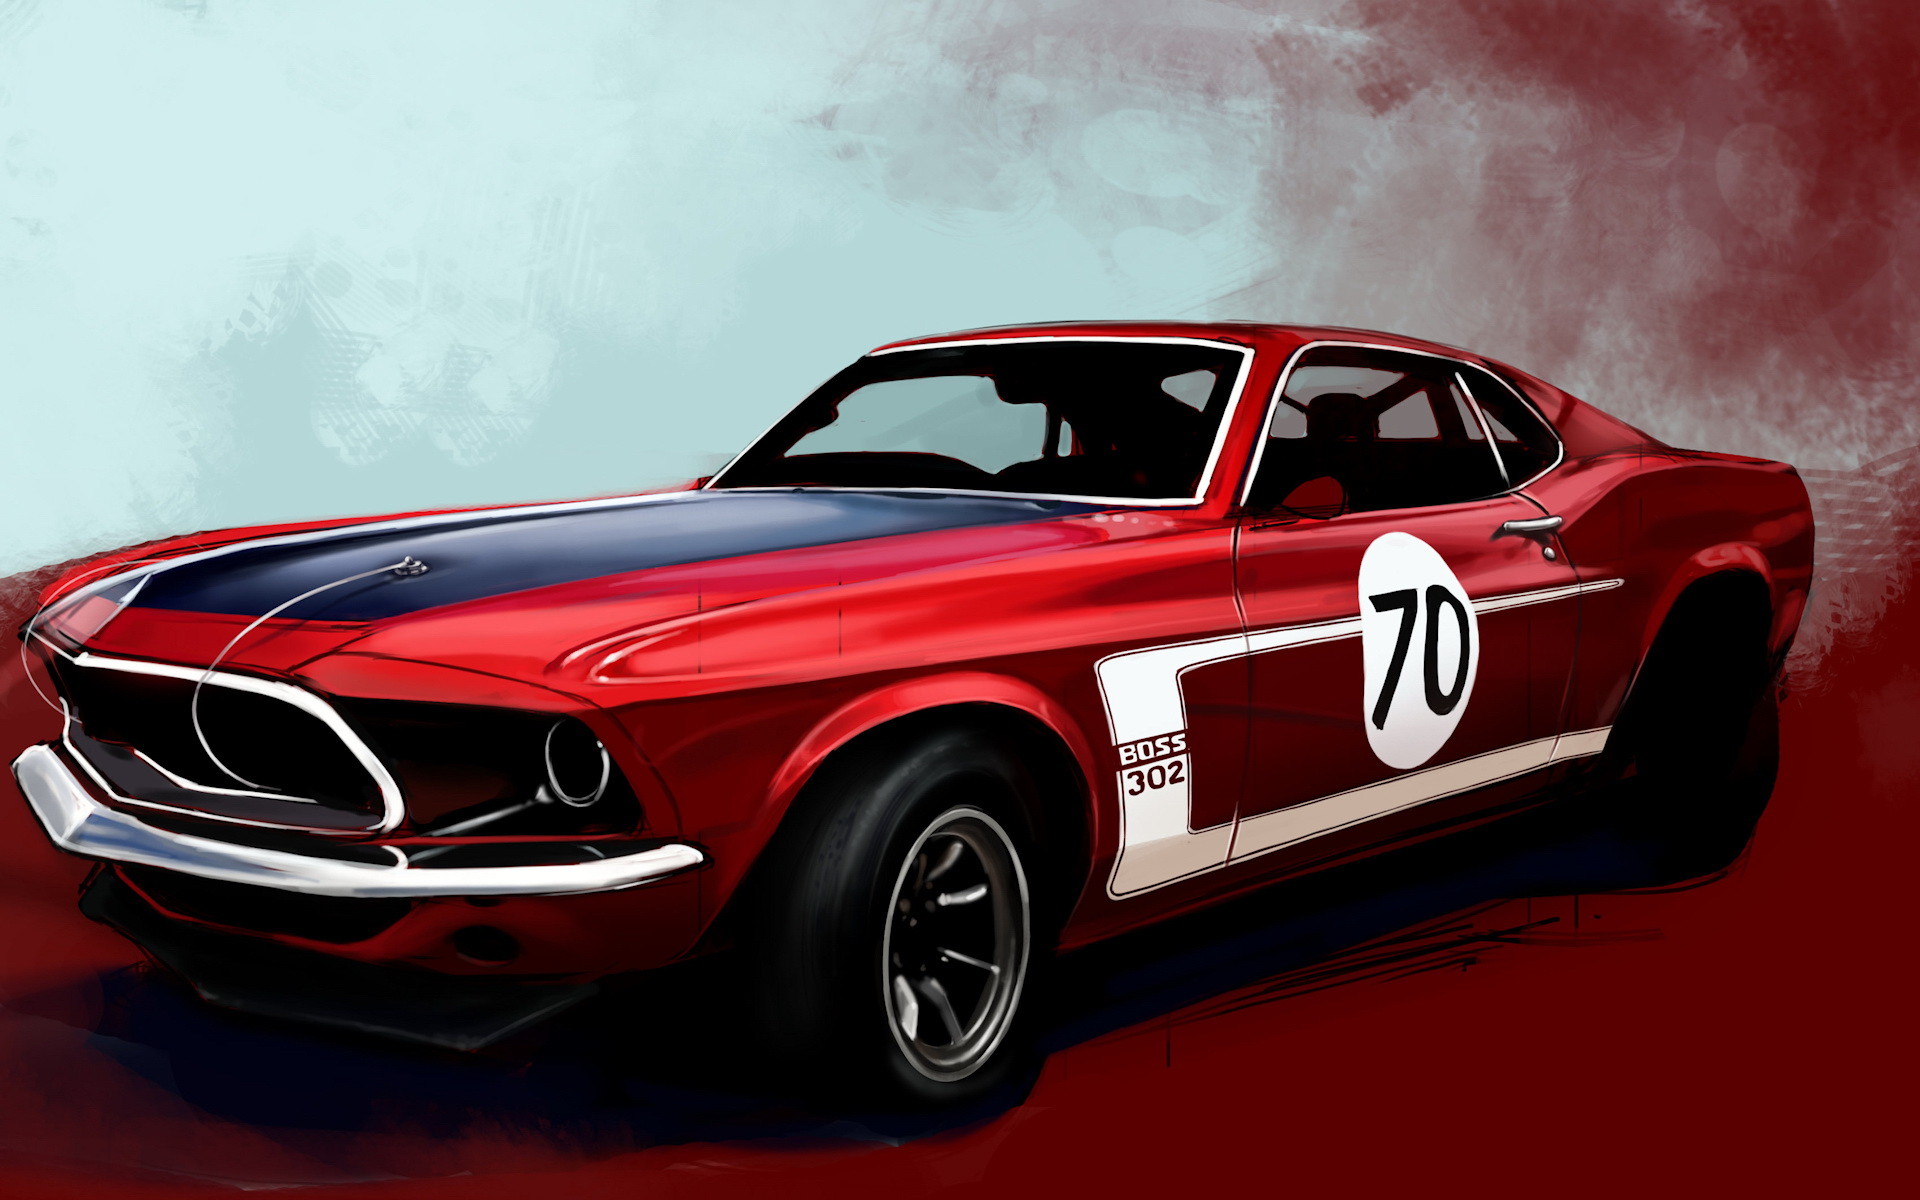 Sport Wallpaper Automobile: 49 Speedy Car Wallpapers For Free Desktop Download